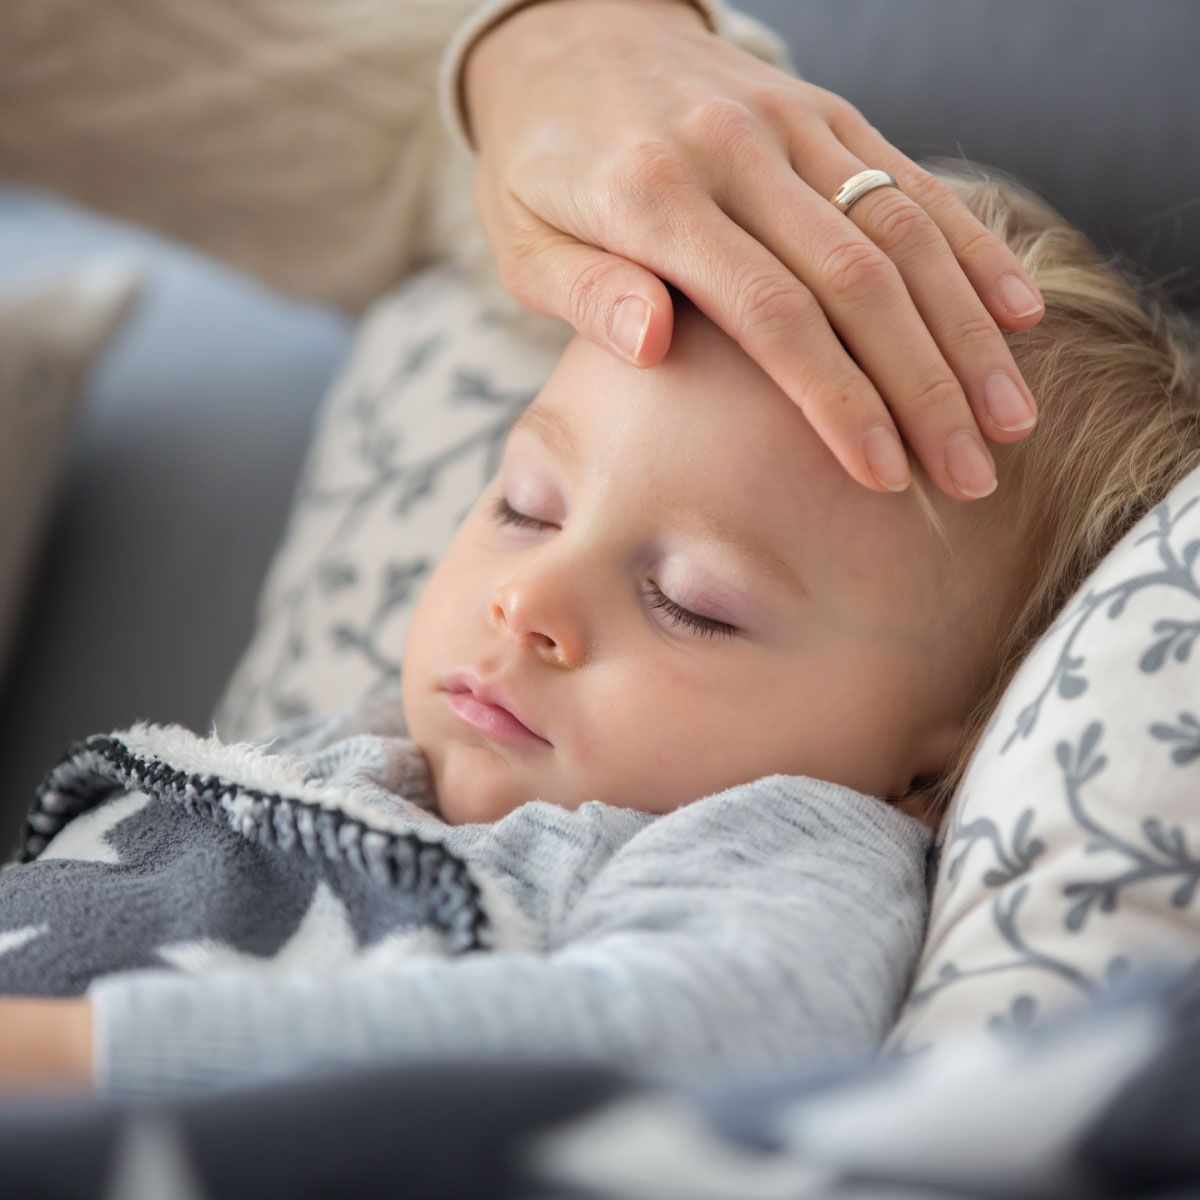 Pharmacie-Lafayette-Blog-Fièvre-Enfant-Malade-min